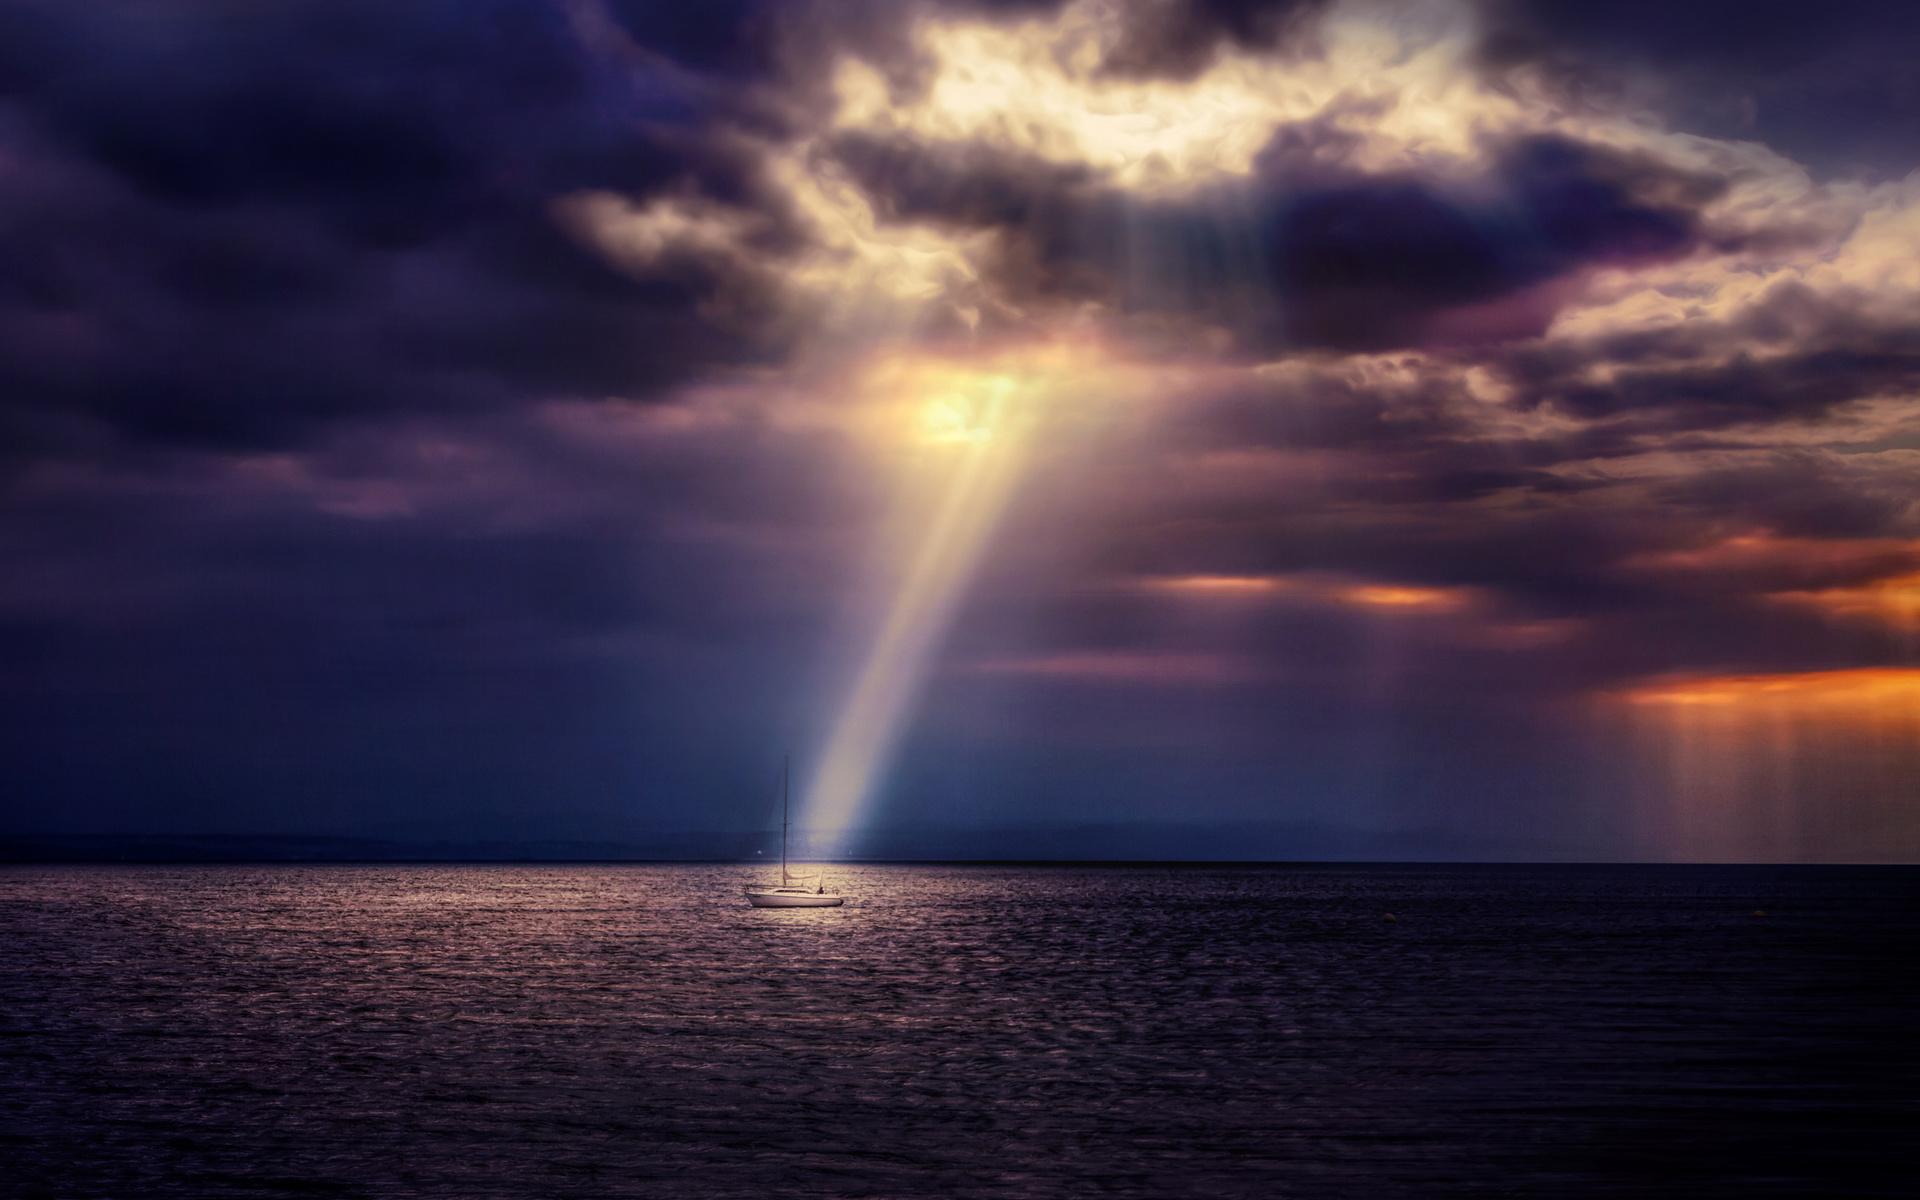 мужская, женская фото лучи солнца сквозь облака нажатии кнопки